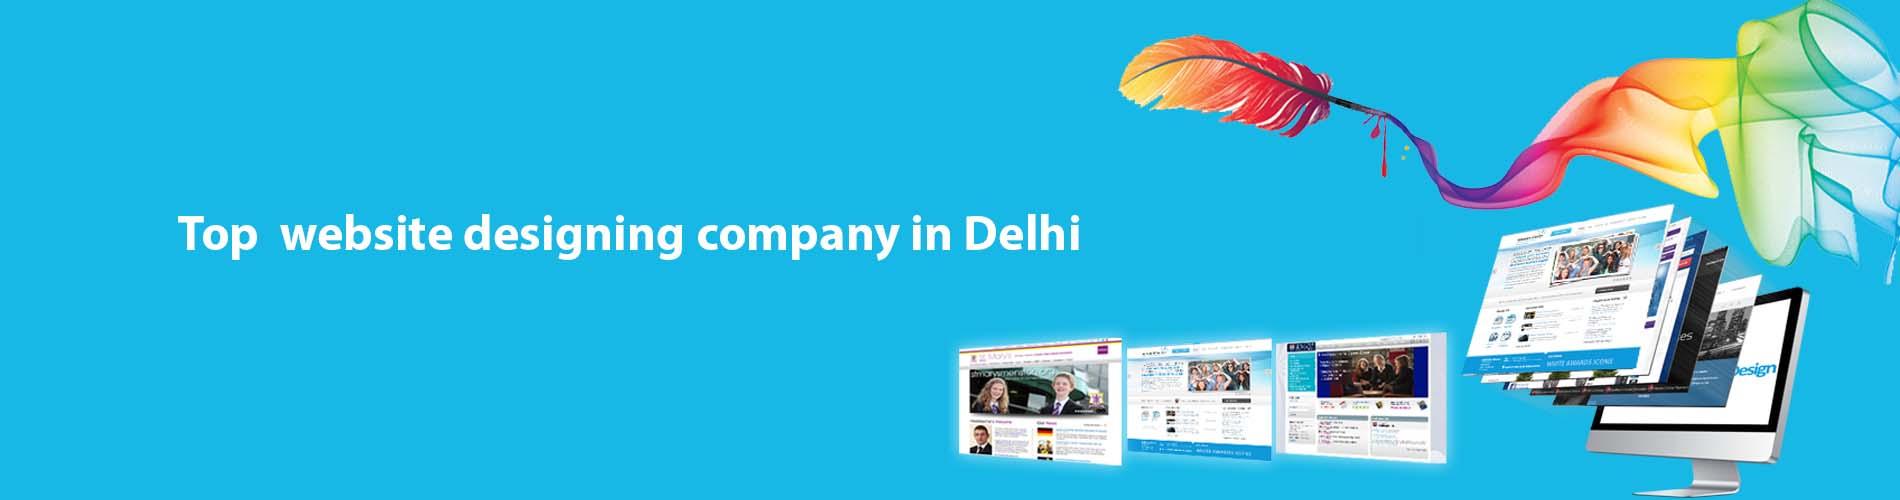 web designing company in delhi